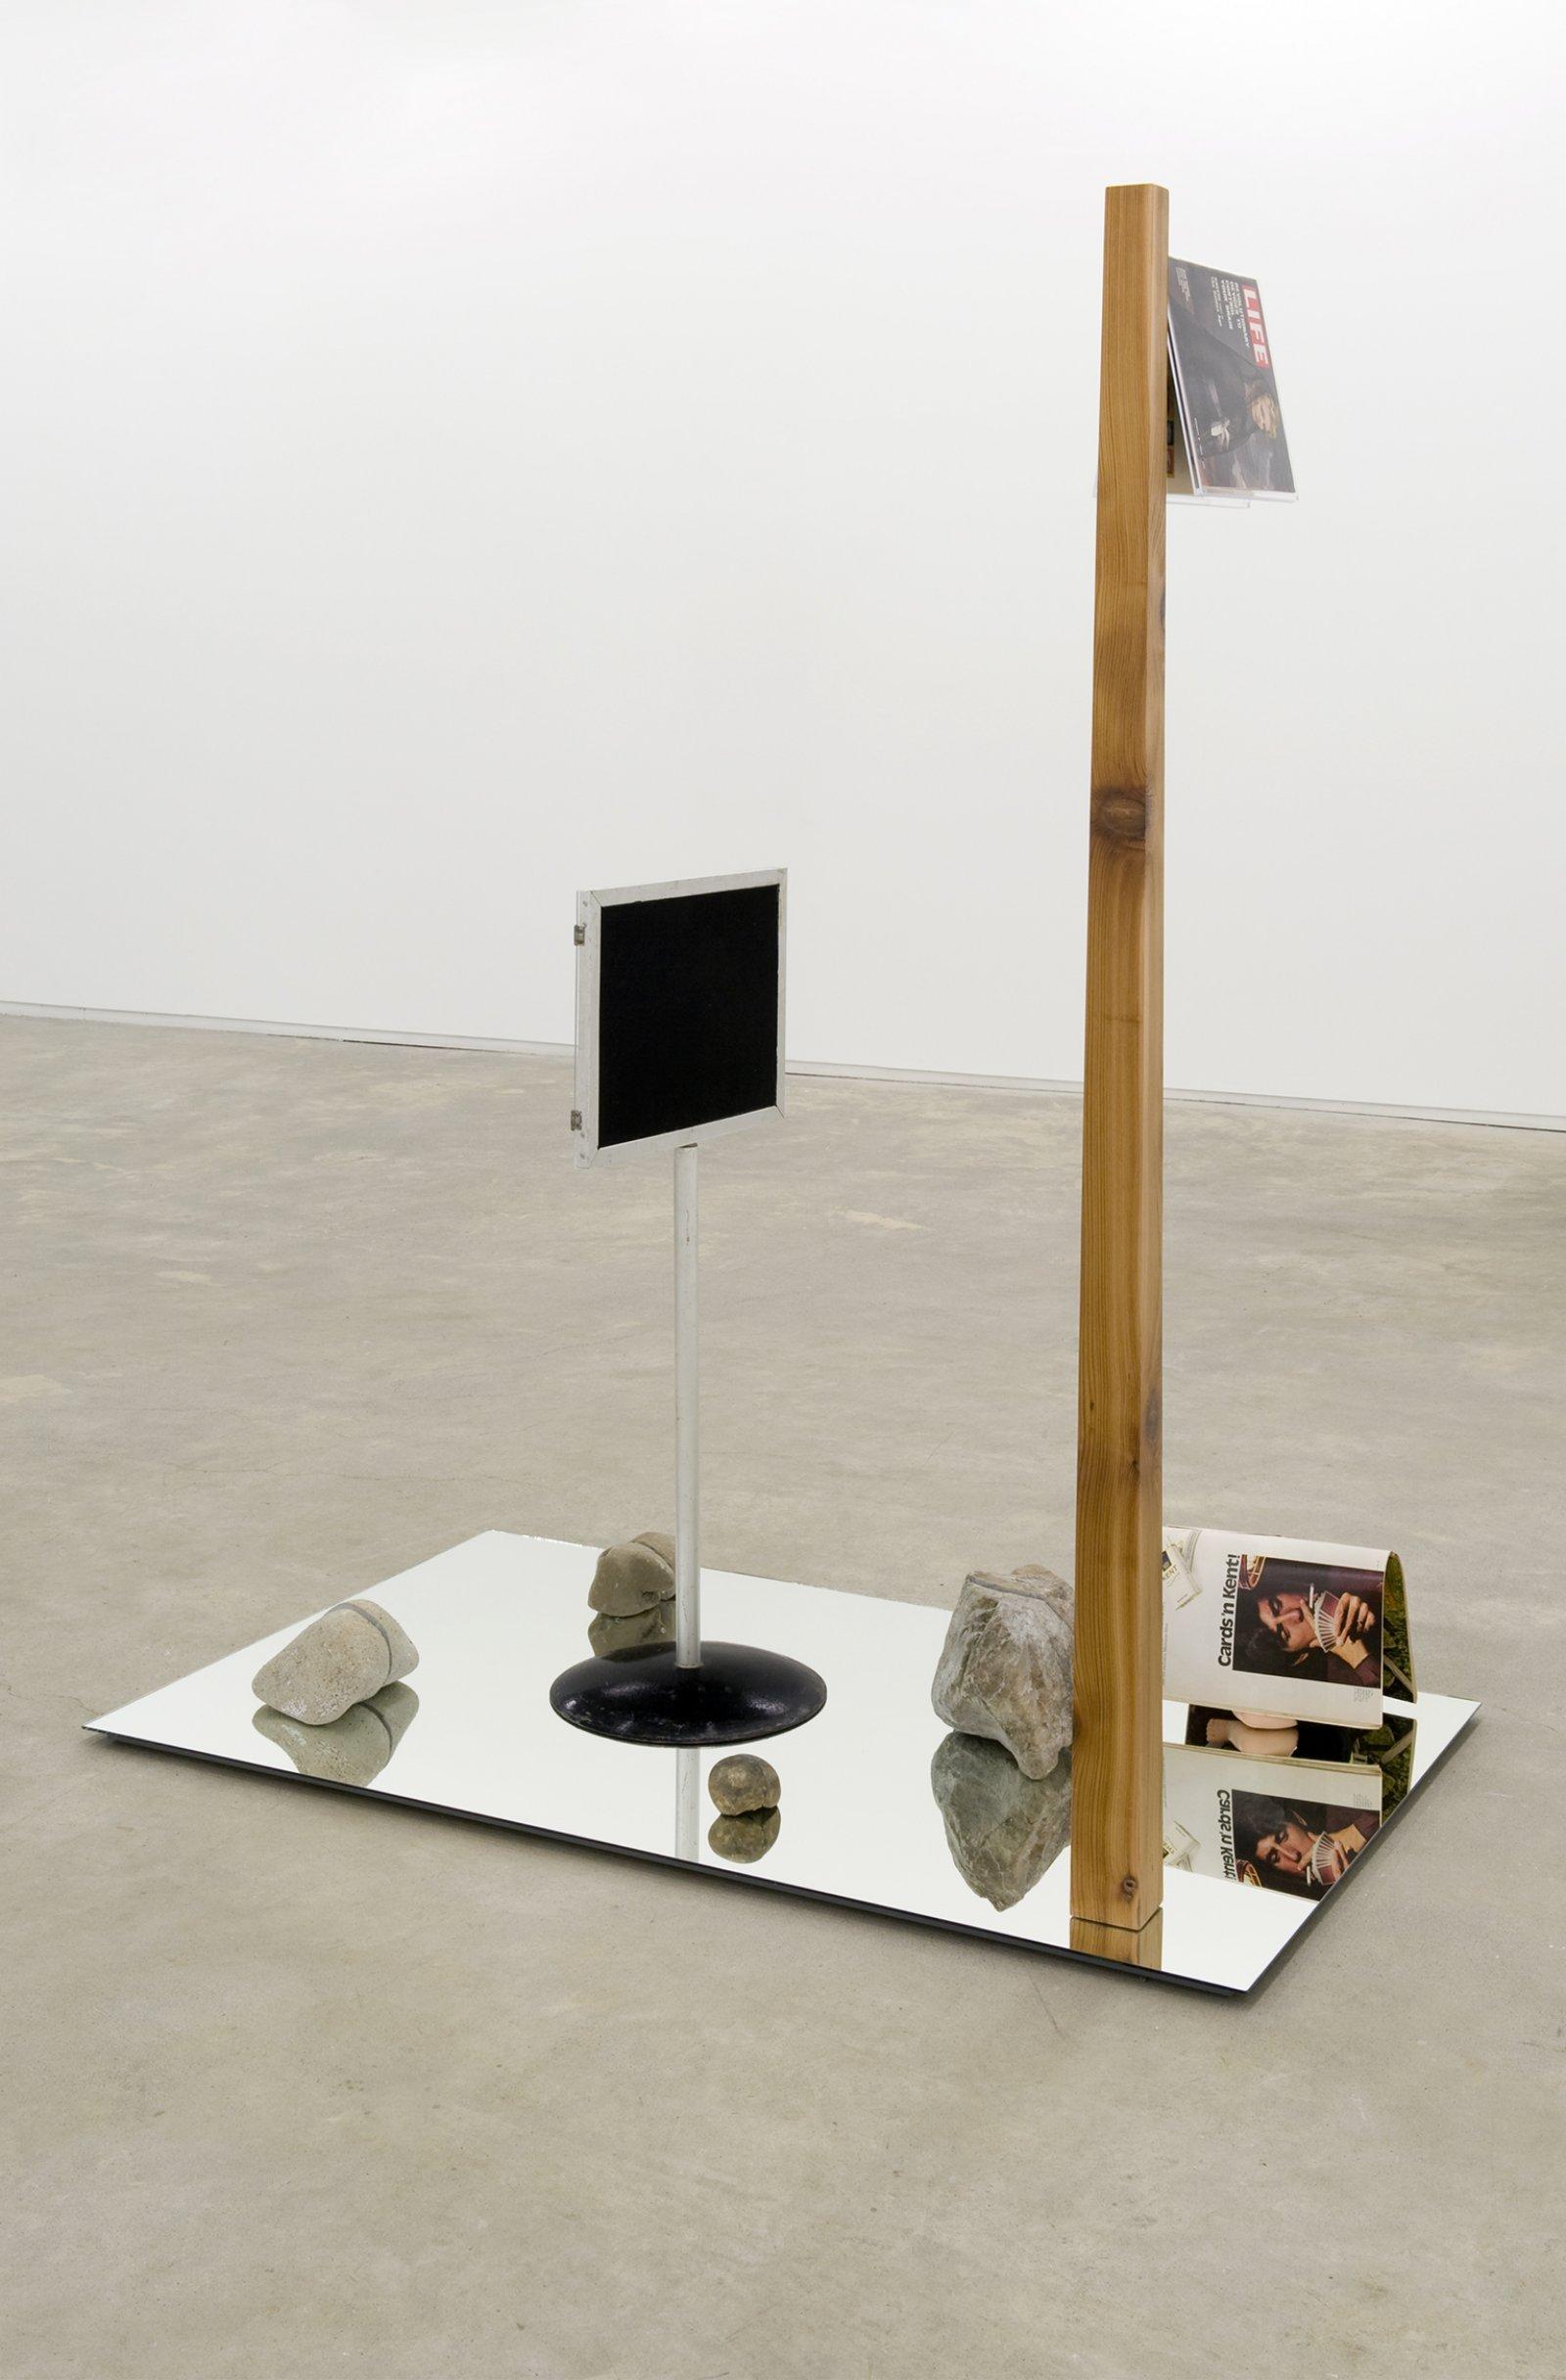 Judy Radul, The Brain Display, 2010, mirror, wood, 5 stones, plastic book holder, Life magazines, doll, 67 x 40 x 80 in. (170 x 102 x 203 cm) by Judy Radul